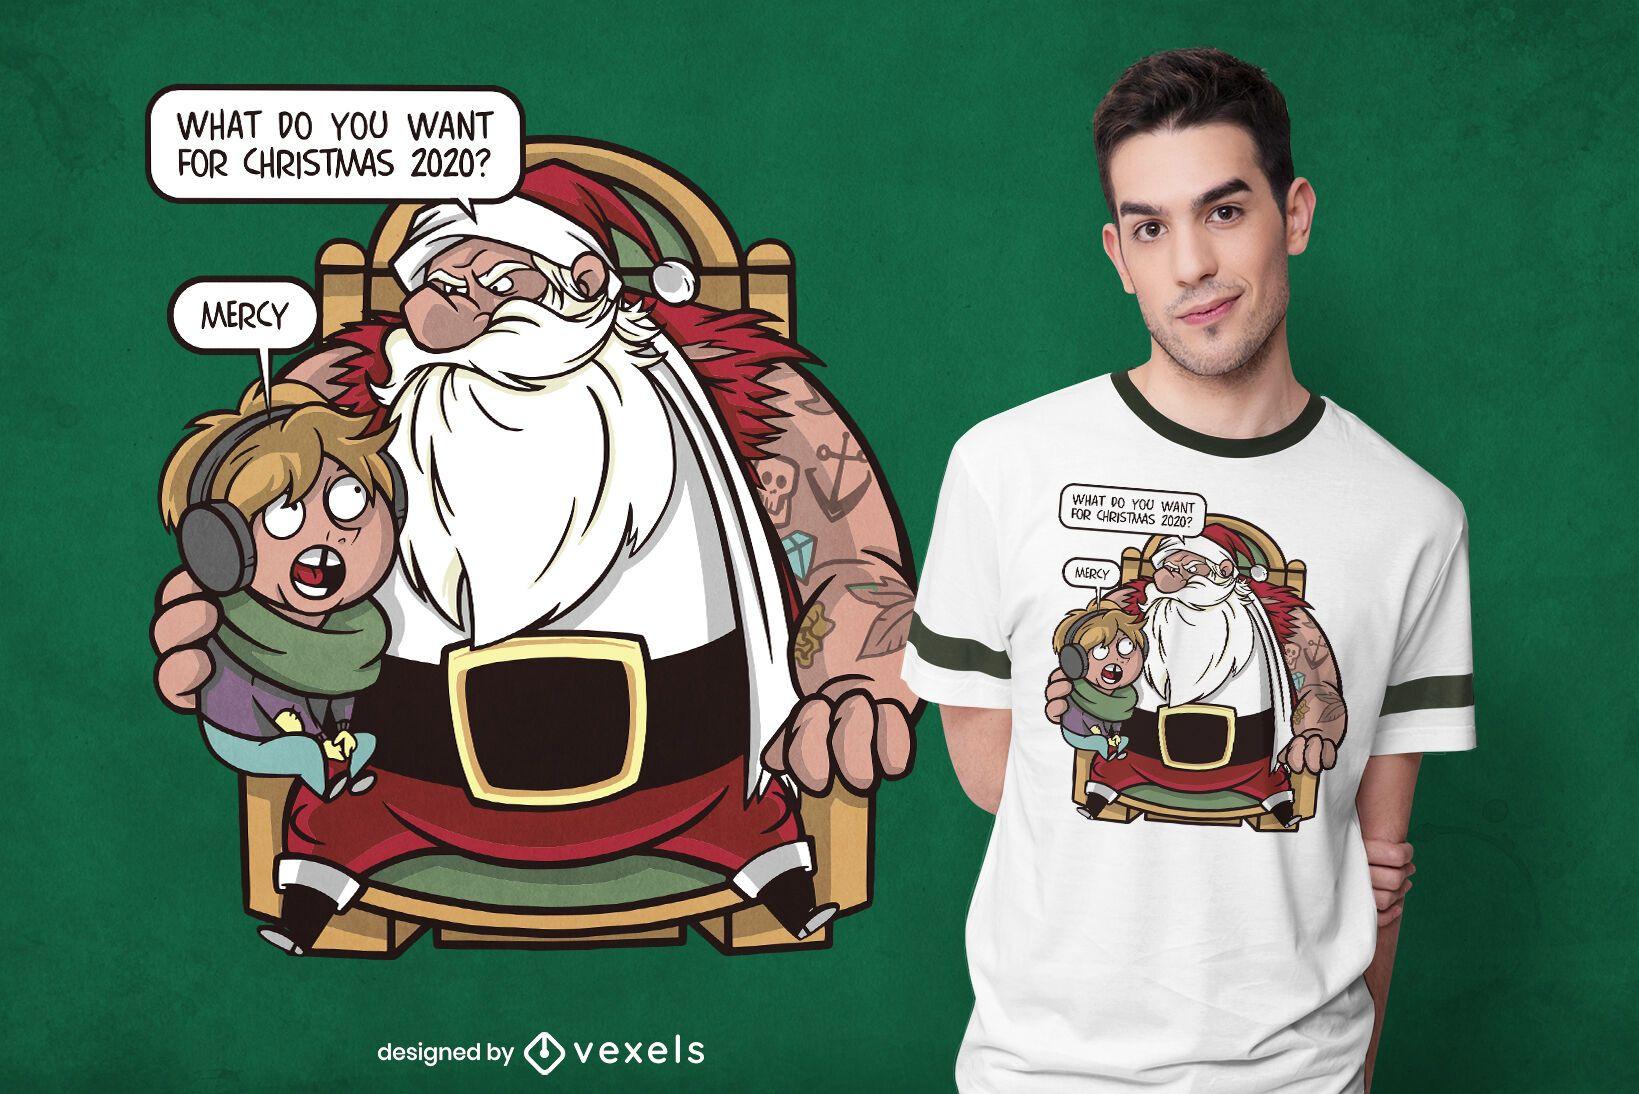 Merciful christmas t-shirt design